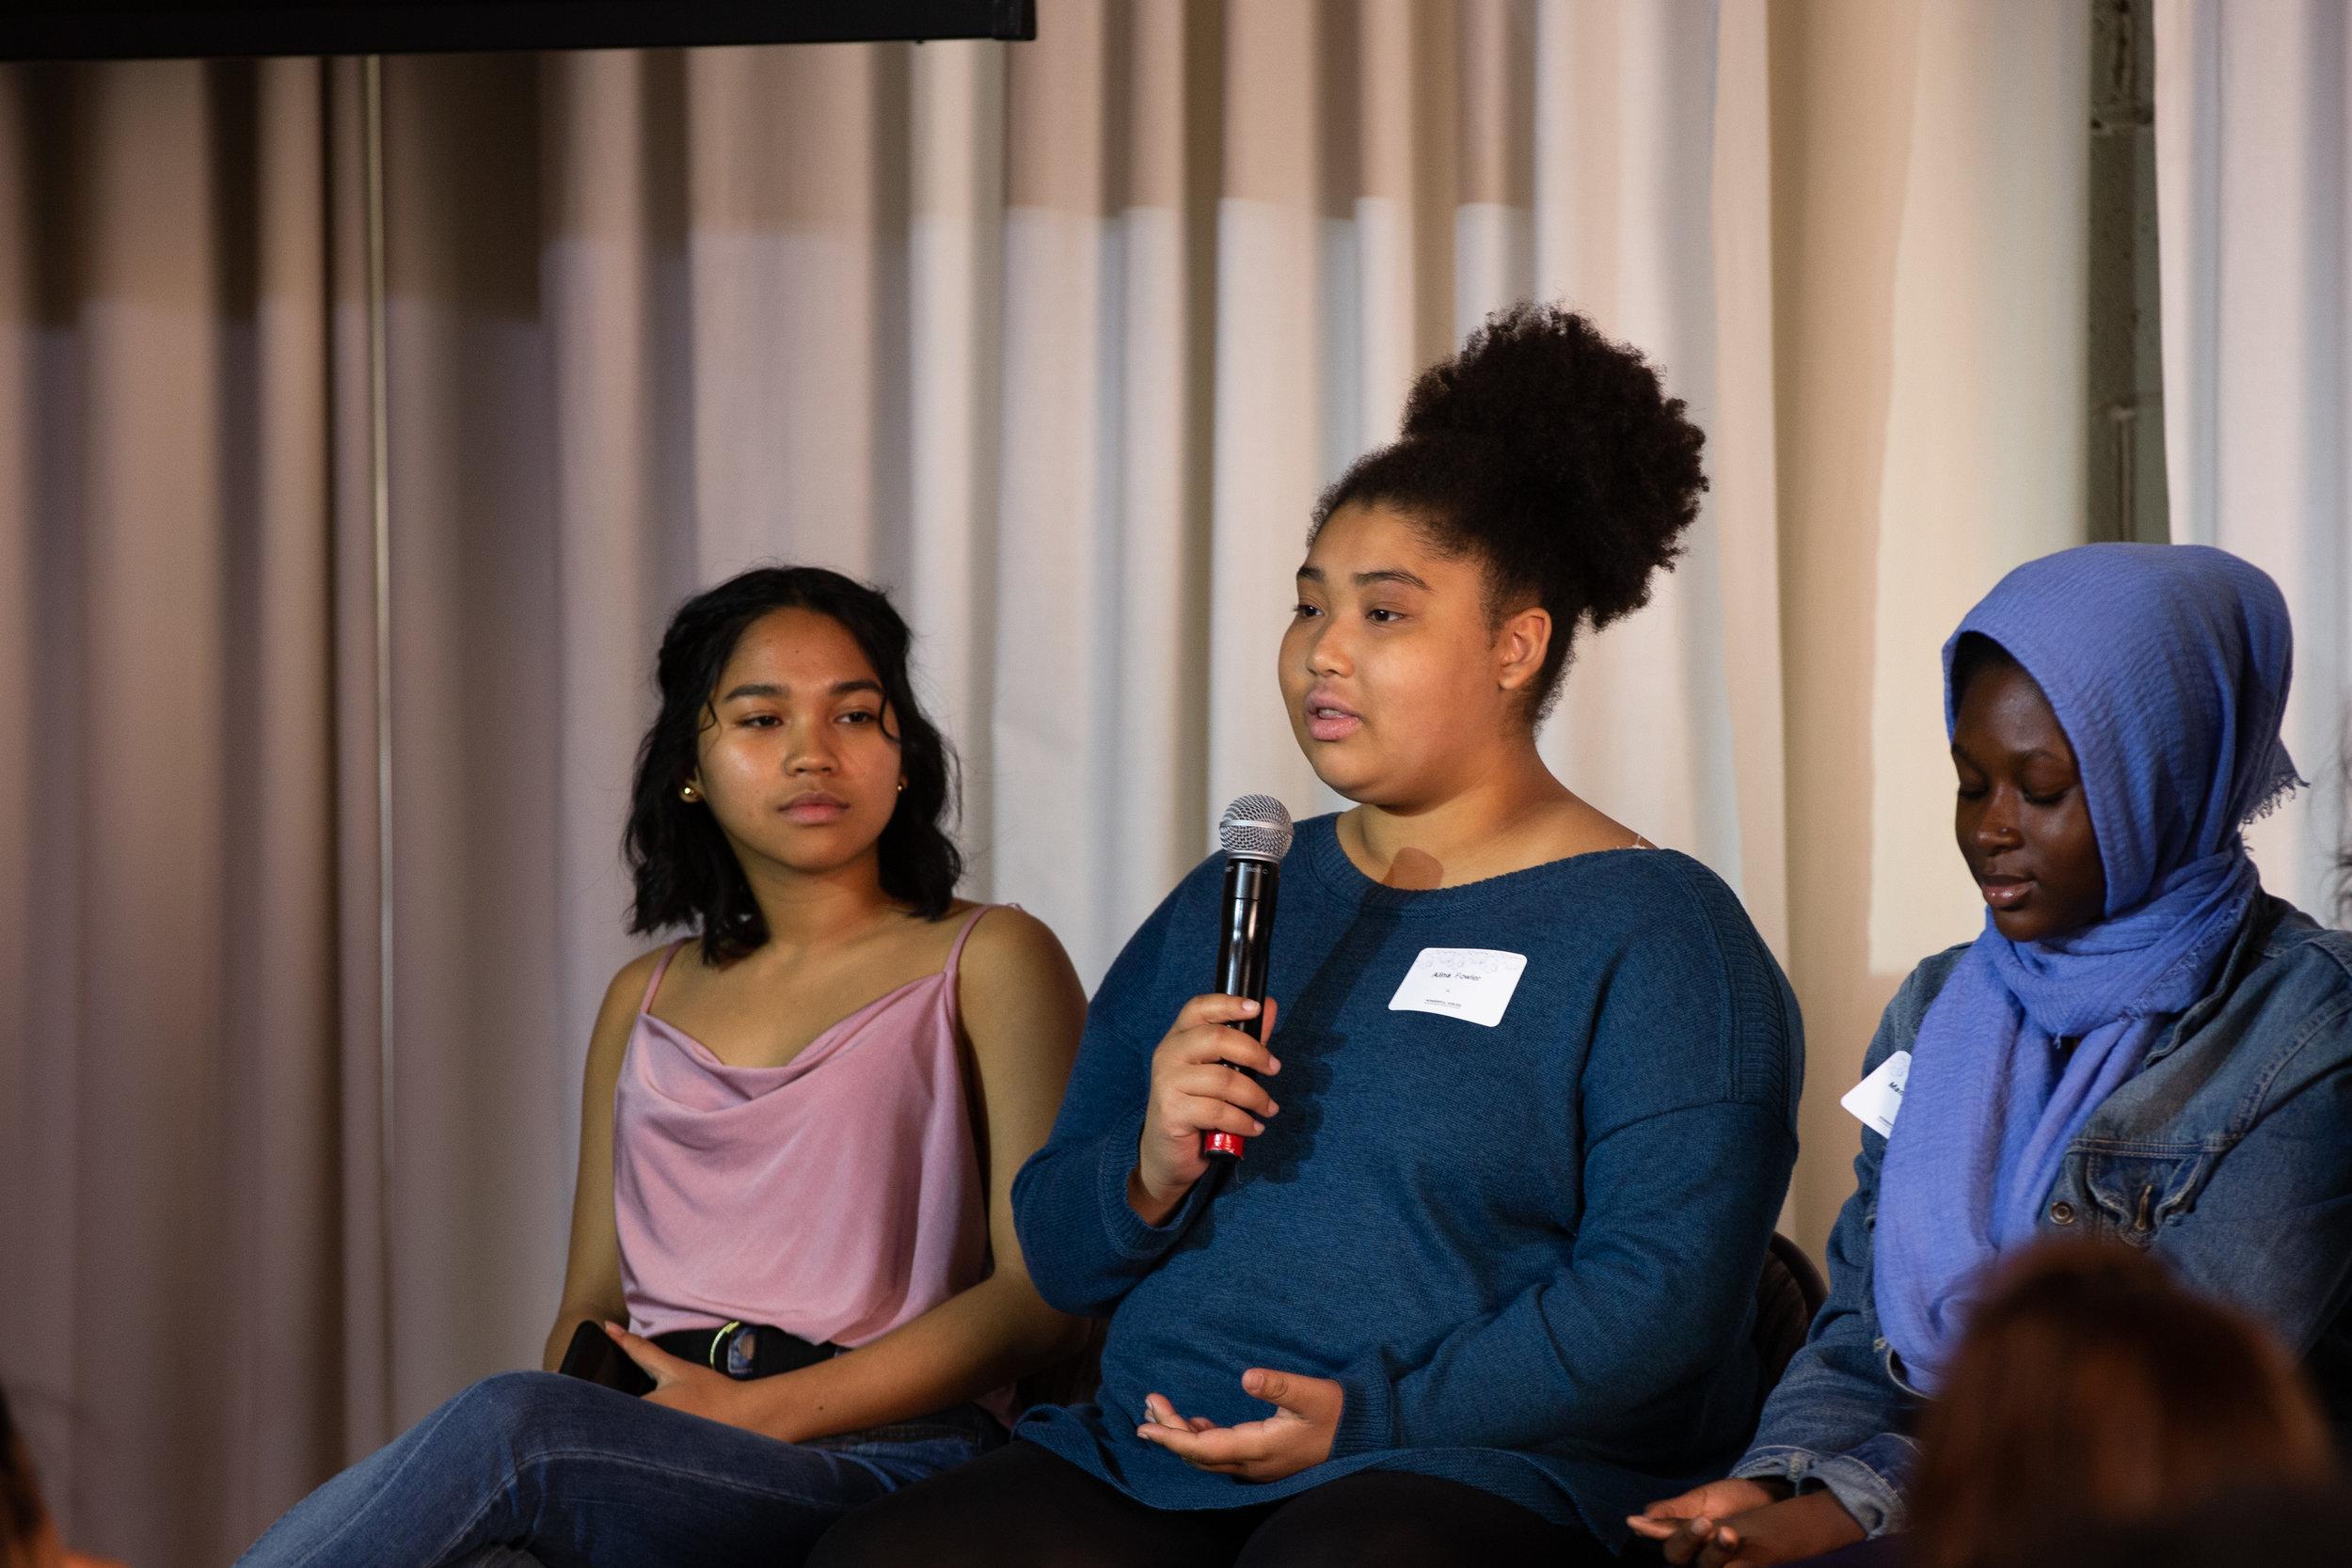 PV Luncheon Alumnae Panel (Oct 18)